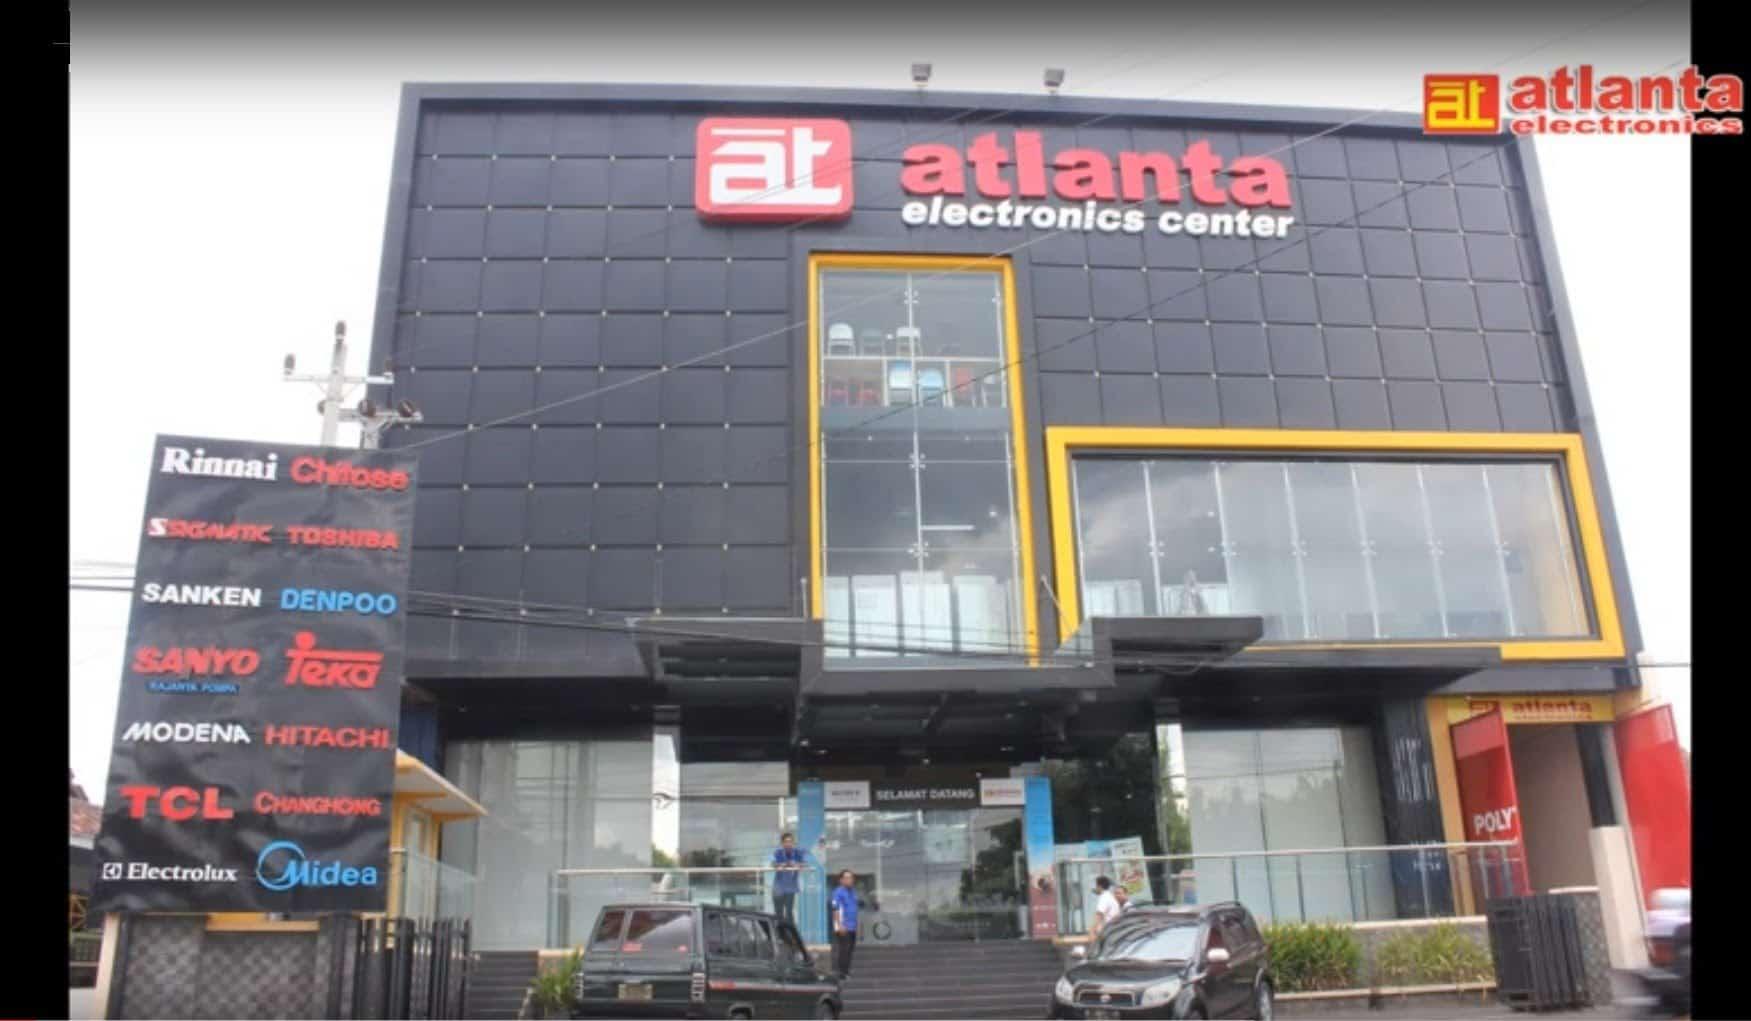 Atlanta Electronics Center